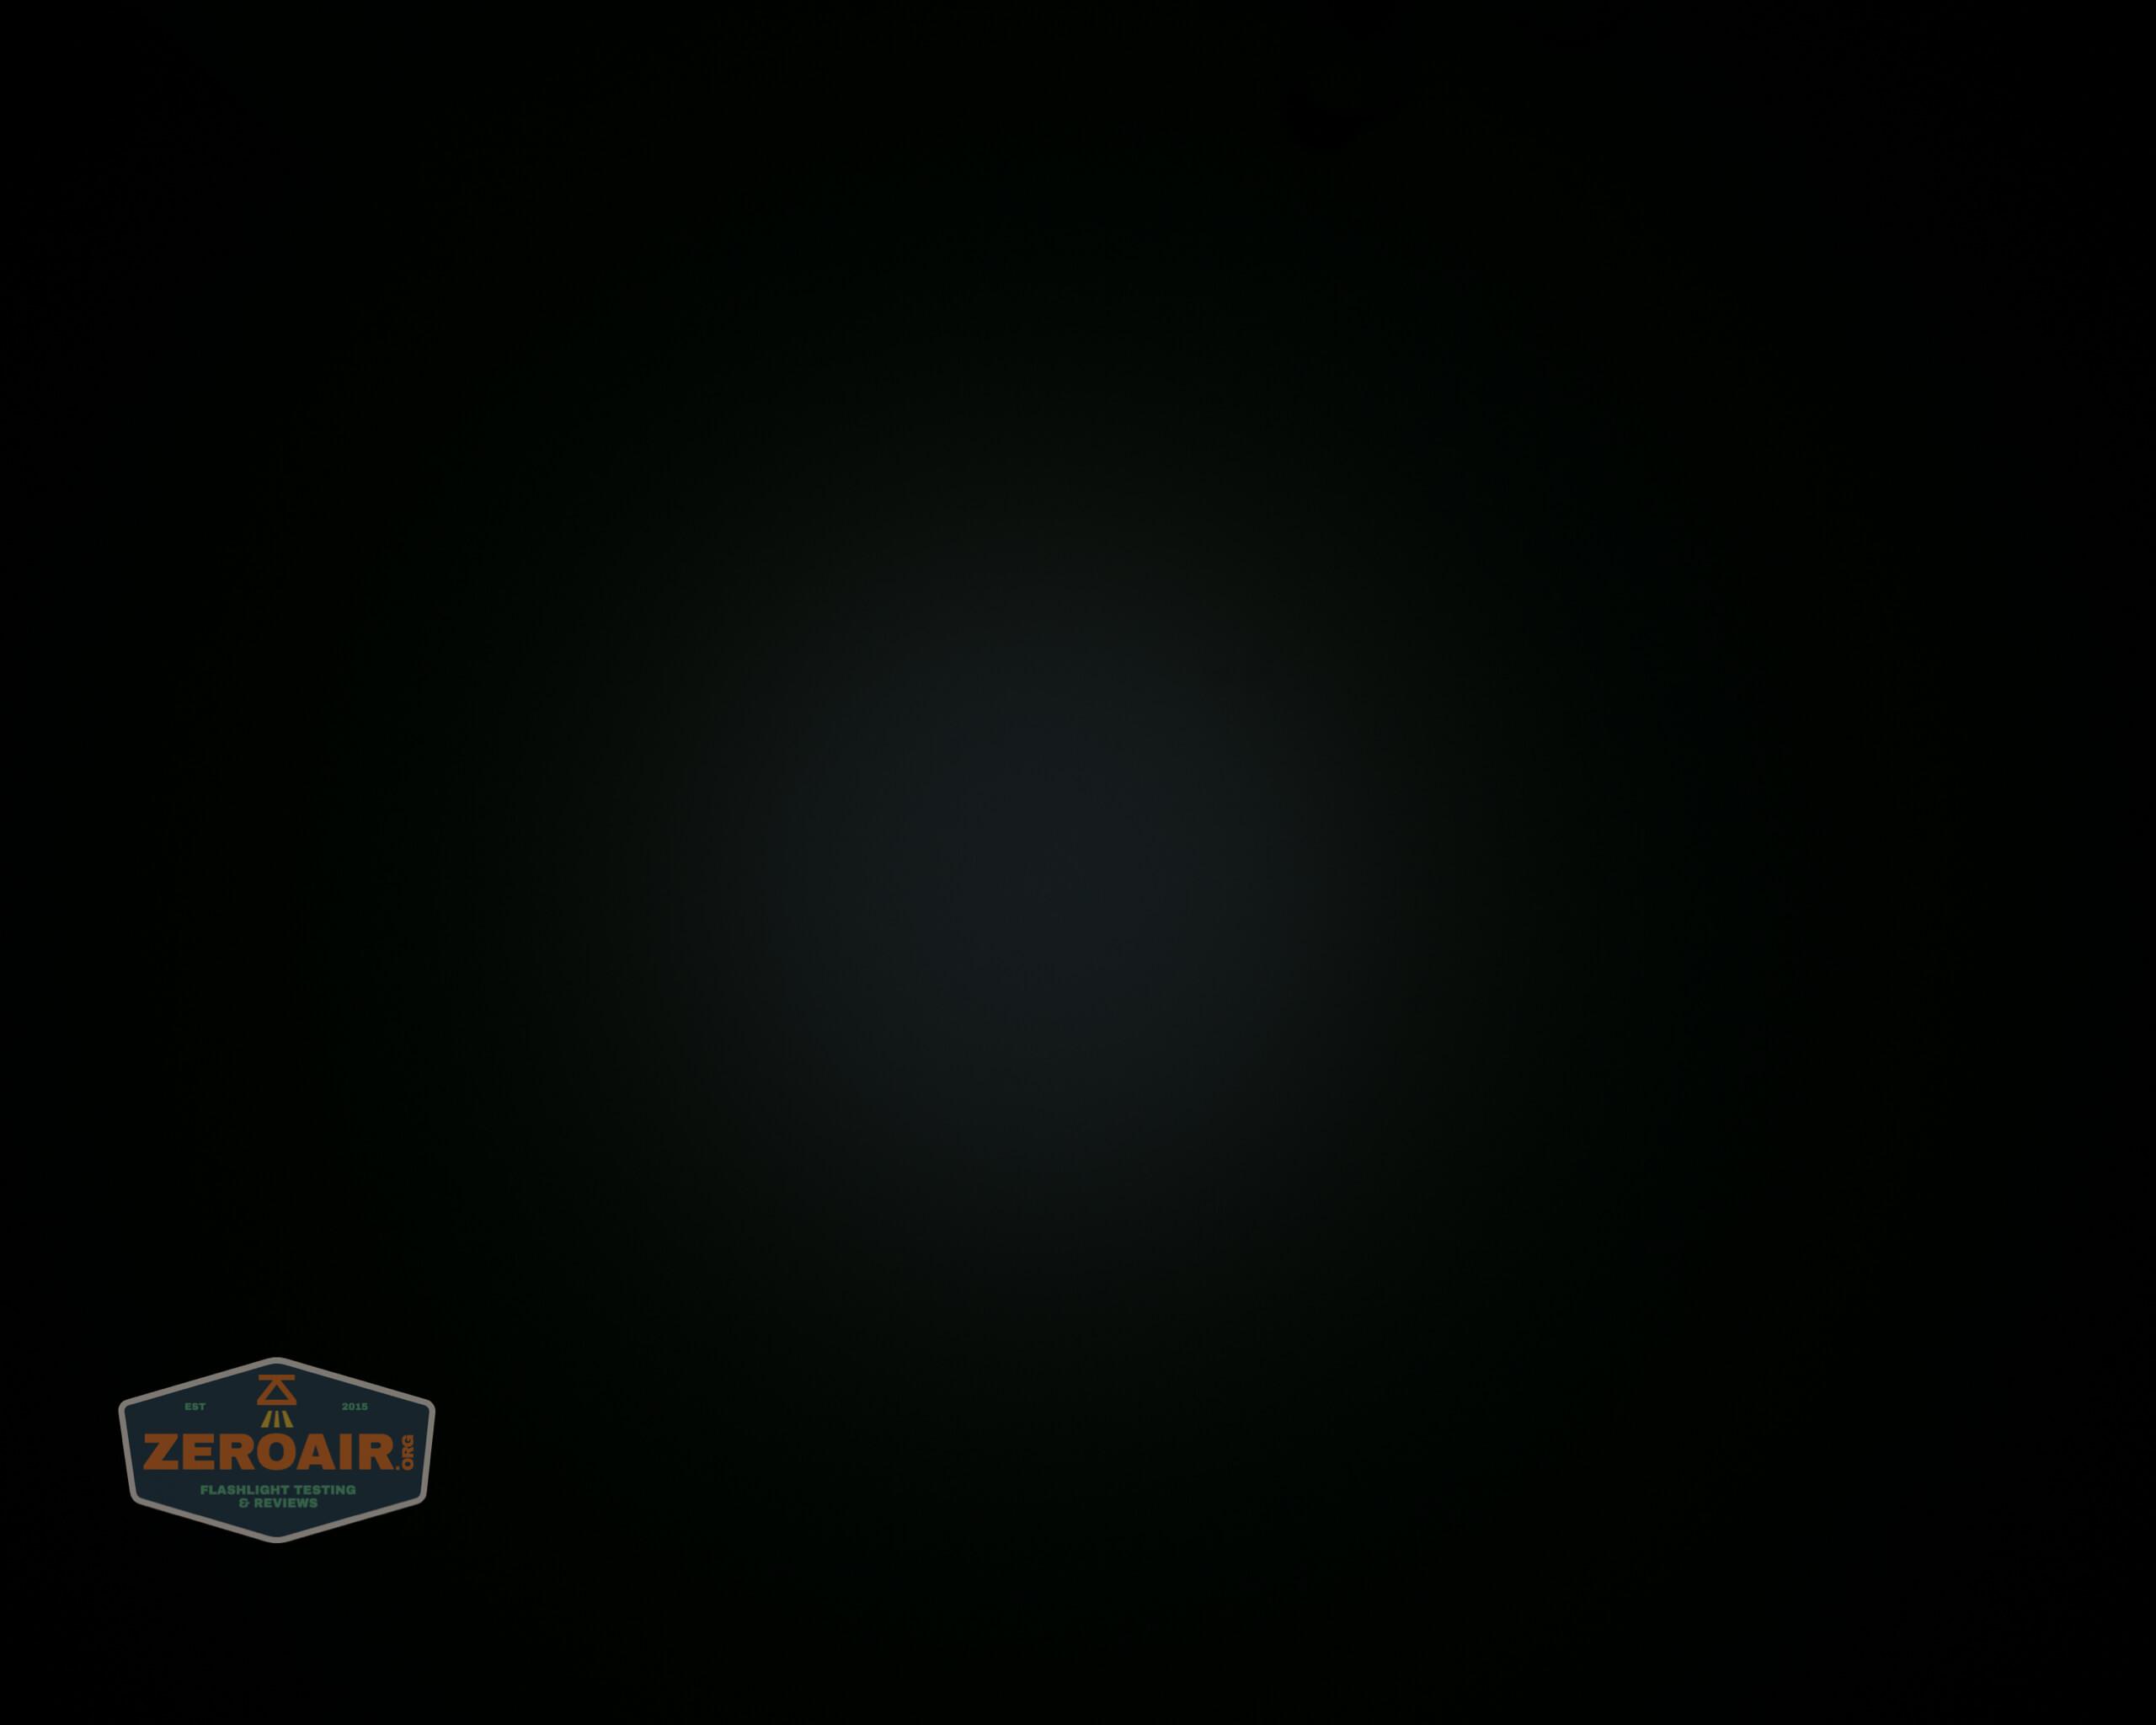 freasygears cyansky m3 titanium pocket flashlight beamshot ceiling 2